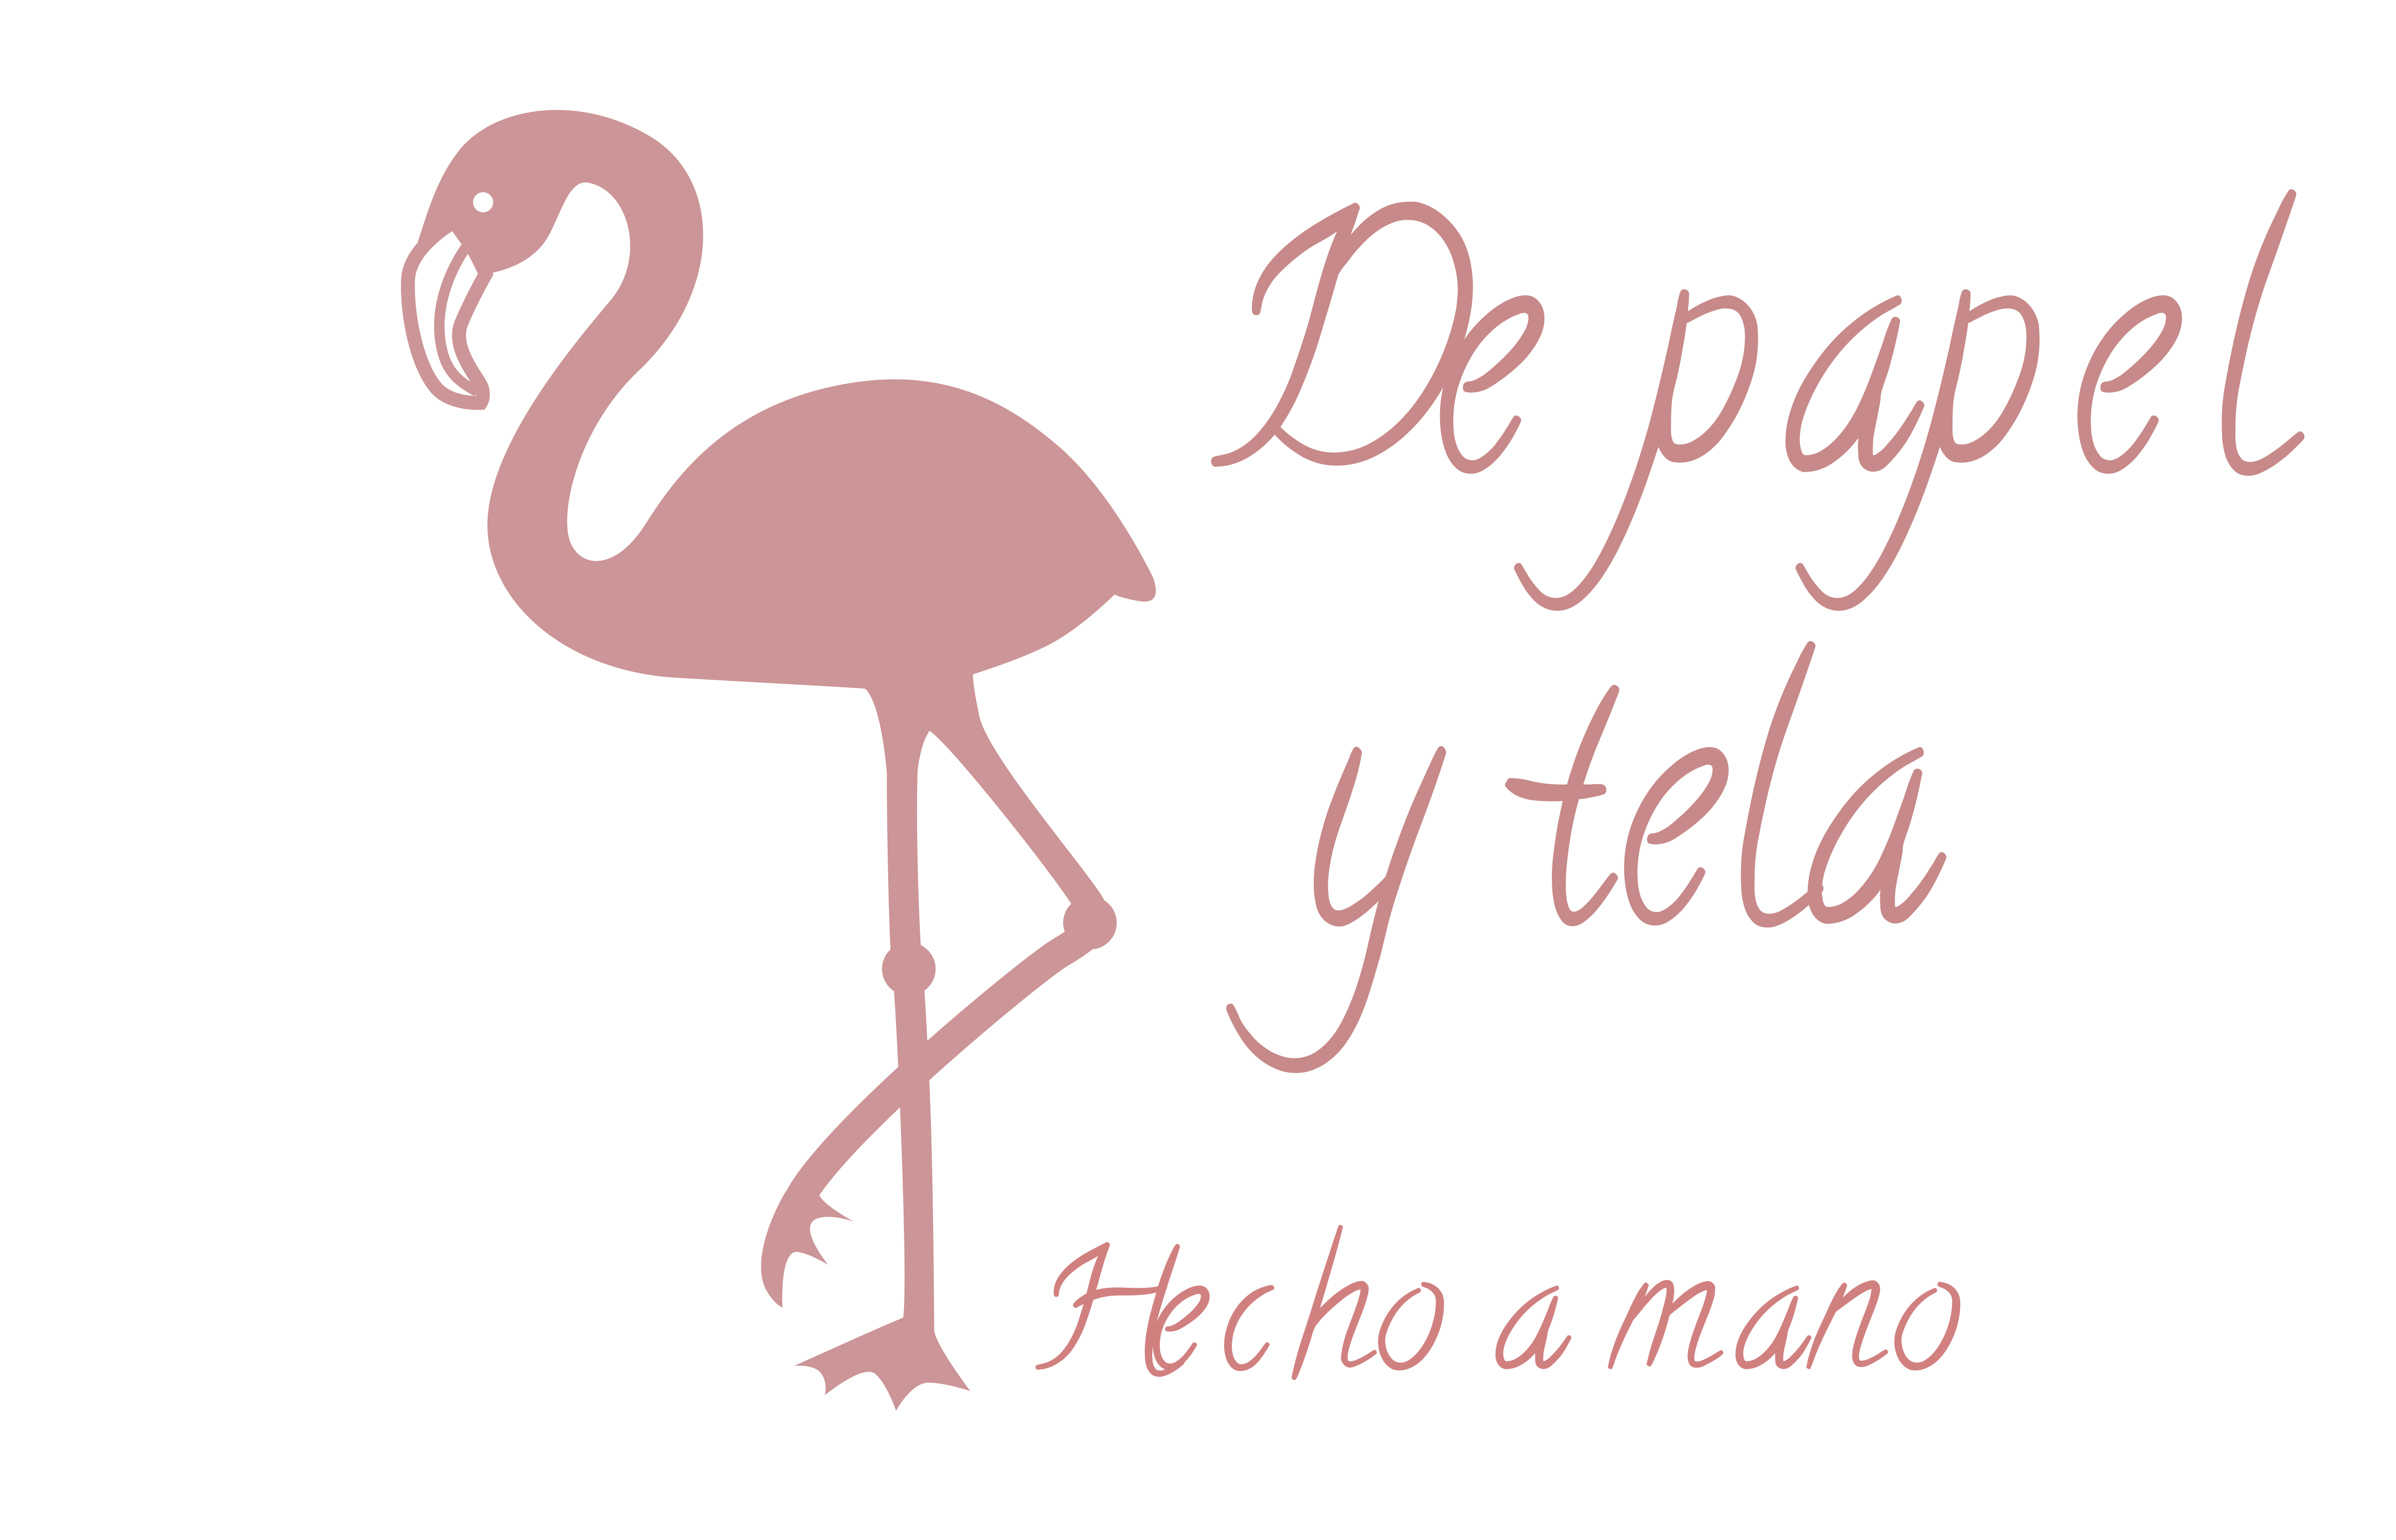 Papel Tela - Scrap - Hecho a mano - Papeleria